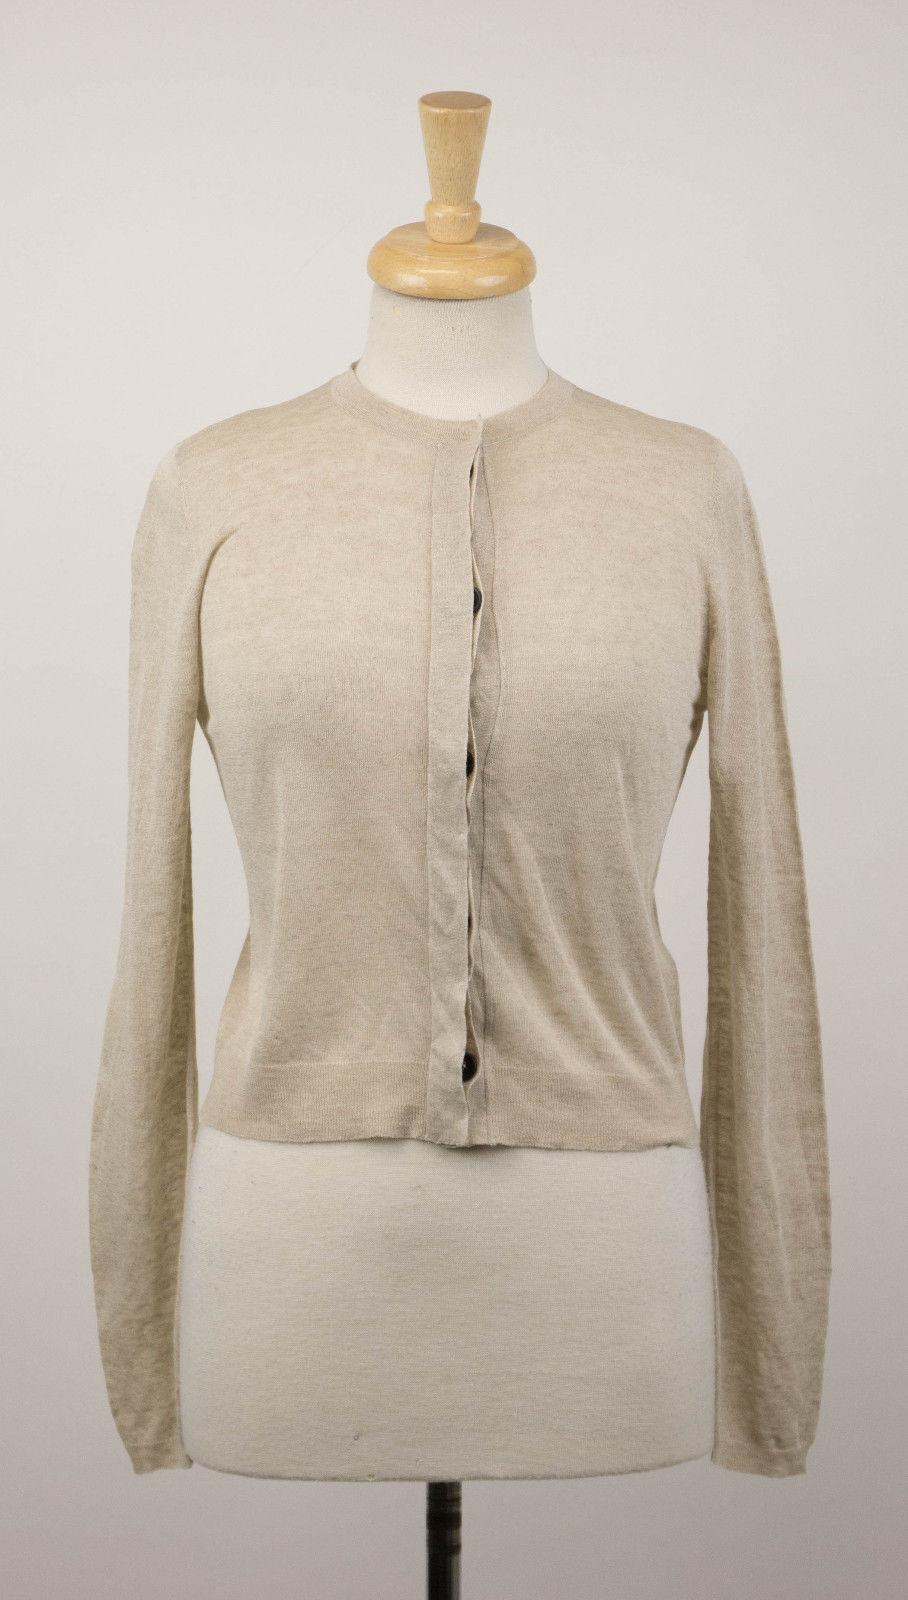 NWT BRUNELLO CUCINELLI Woman's Brown Linen Blend Cardigan Sweater Size M